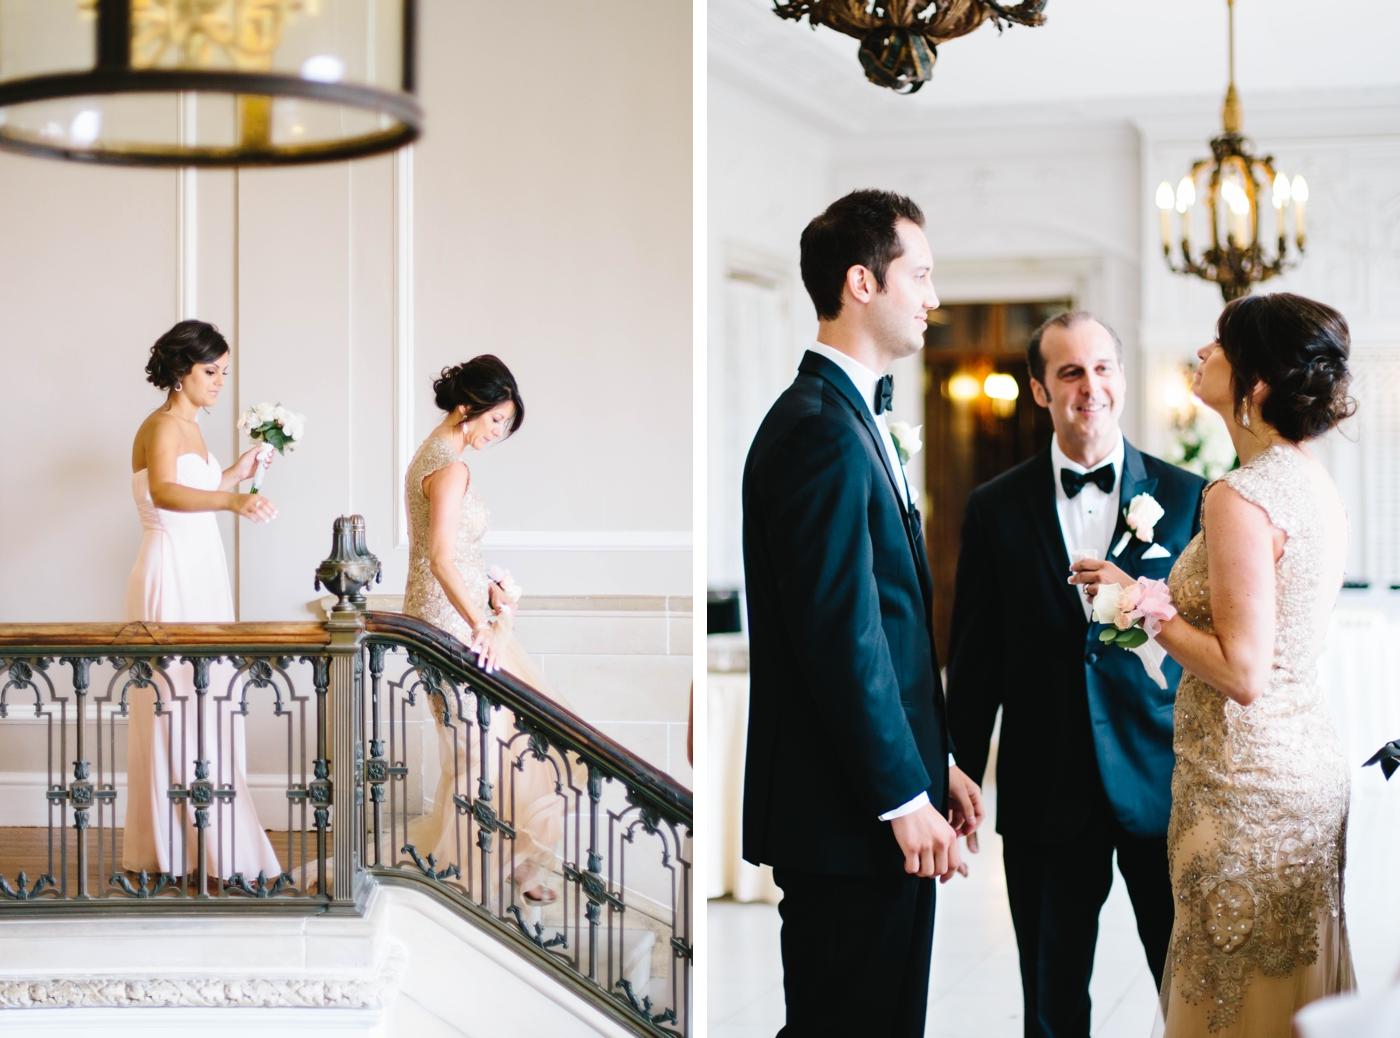 chicago-fine-art-wedding-photography-smeja18